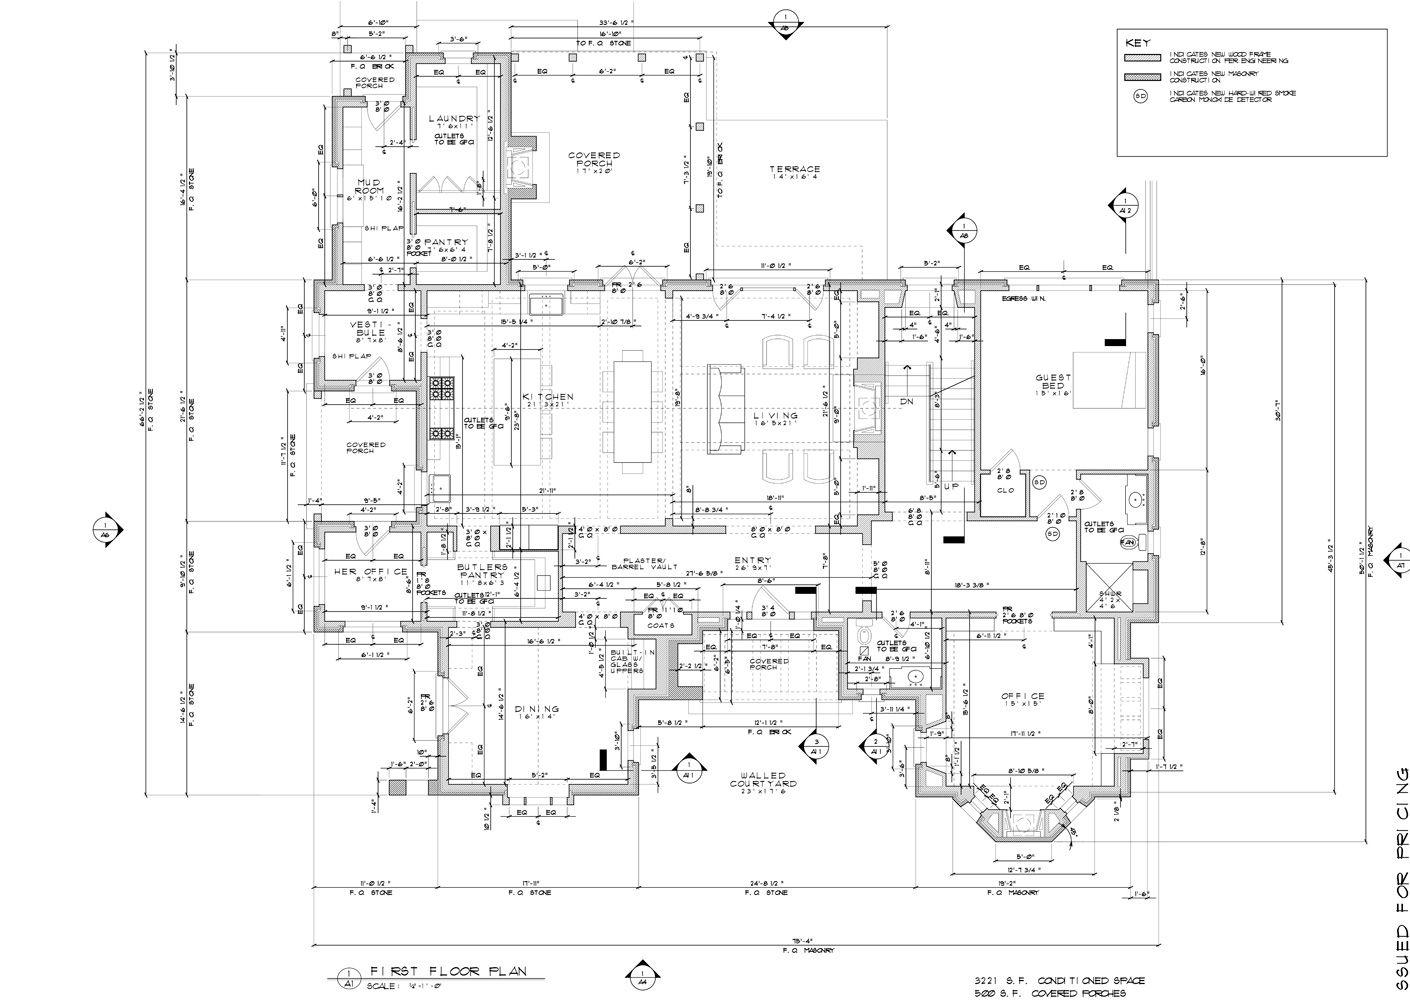 A1 2 Jpg Floor Plan Layout Construction Documents Plan Sketch